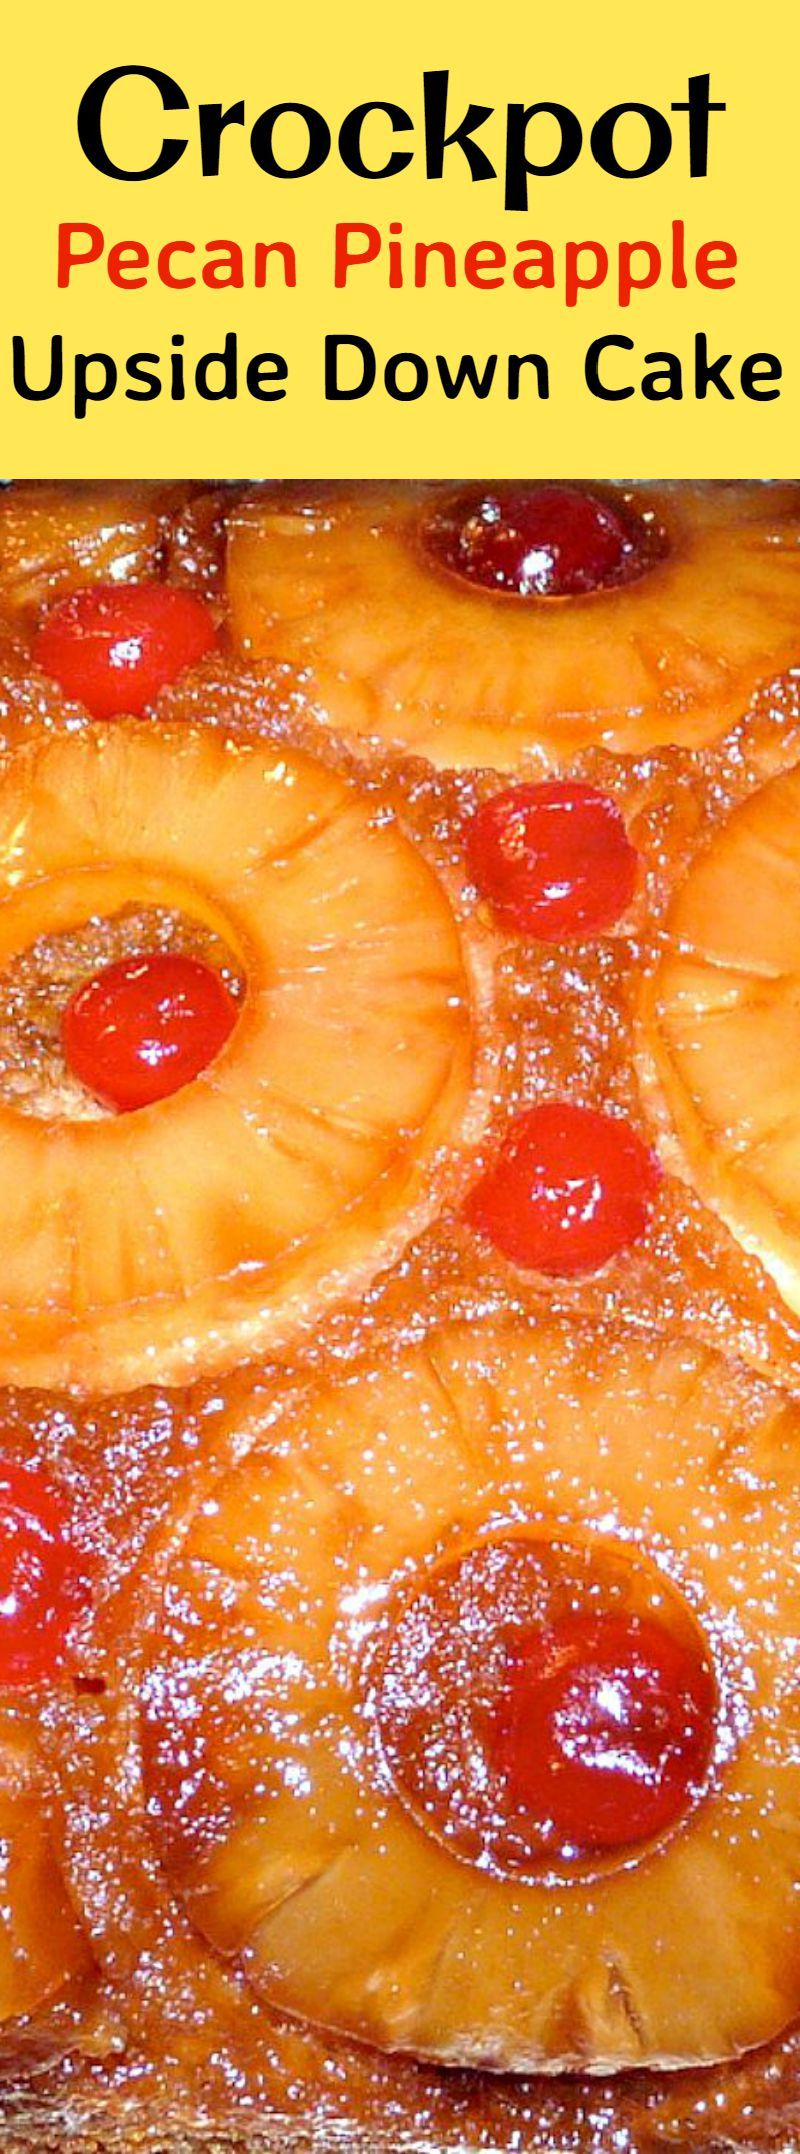 Easy Upside Down Pineapple Cake Nz